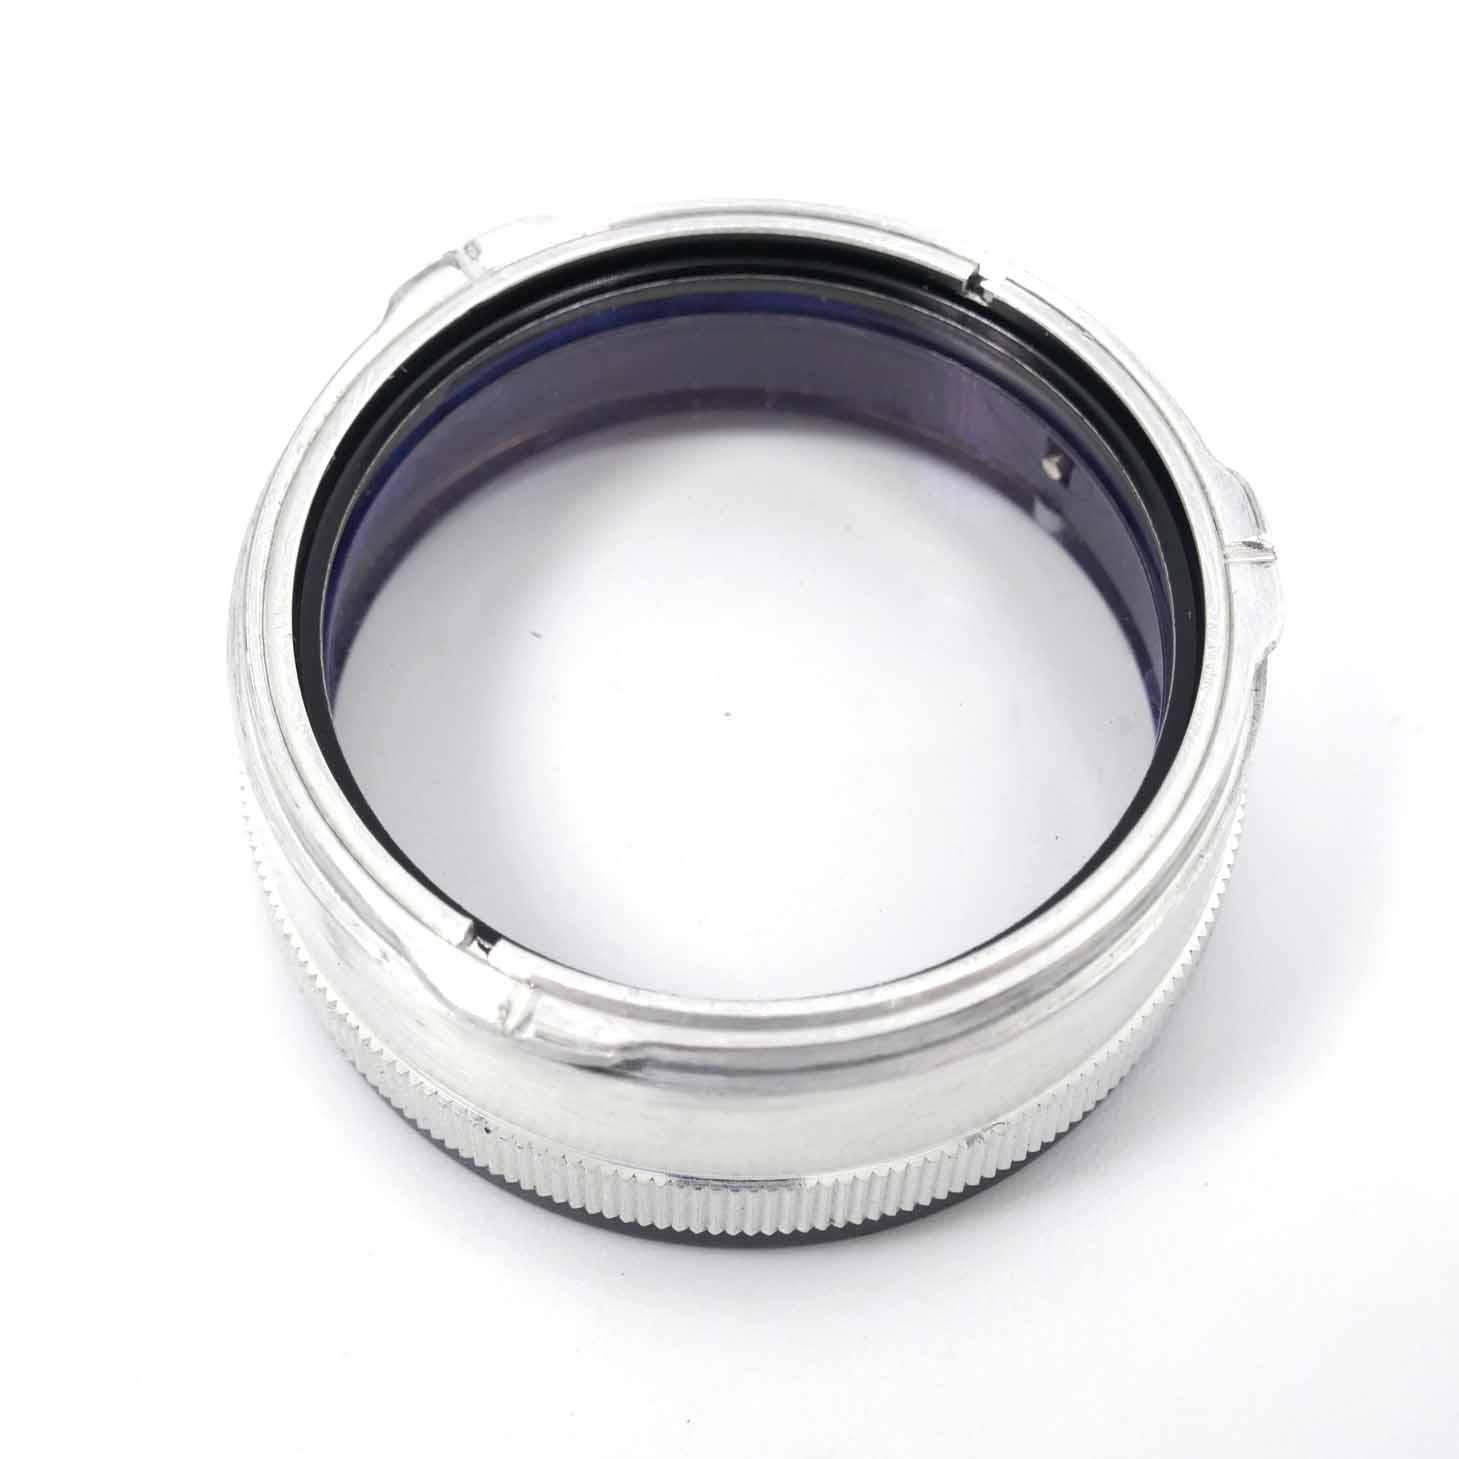 clean-cameras-Rolleinar-1-Bajonett-I-03